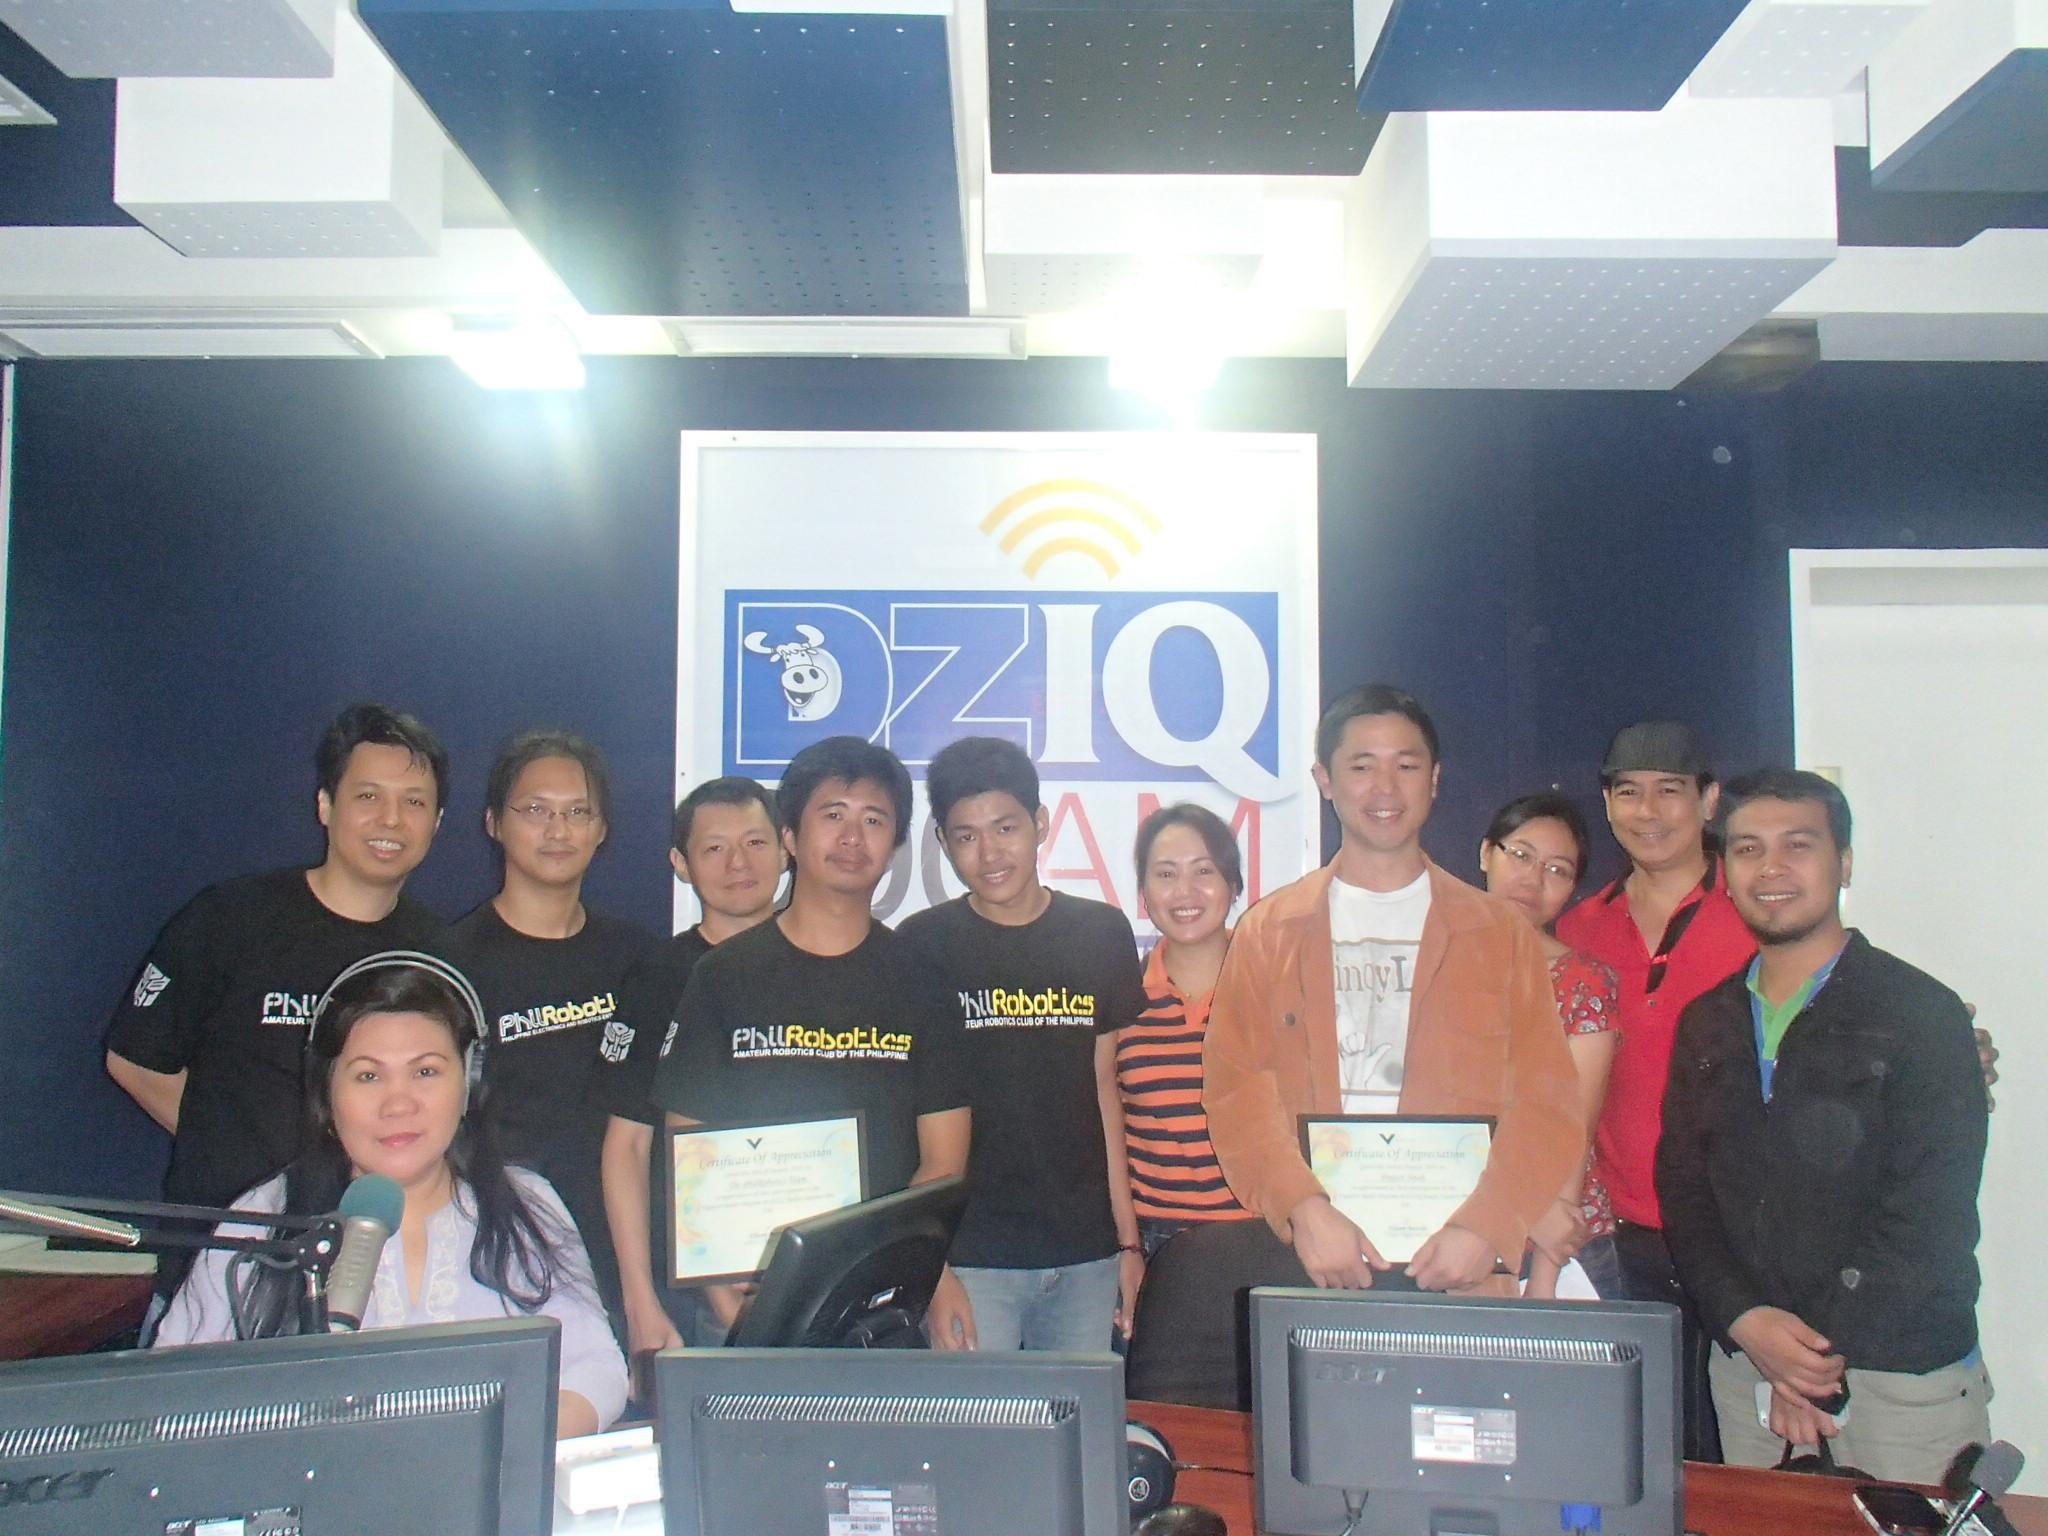 Vigattin Radio with Project NOAH and PhilRobotics